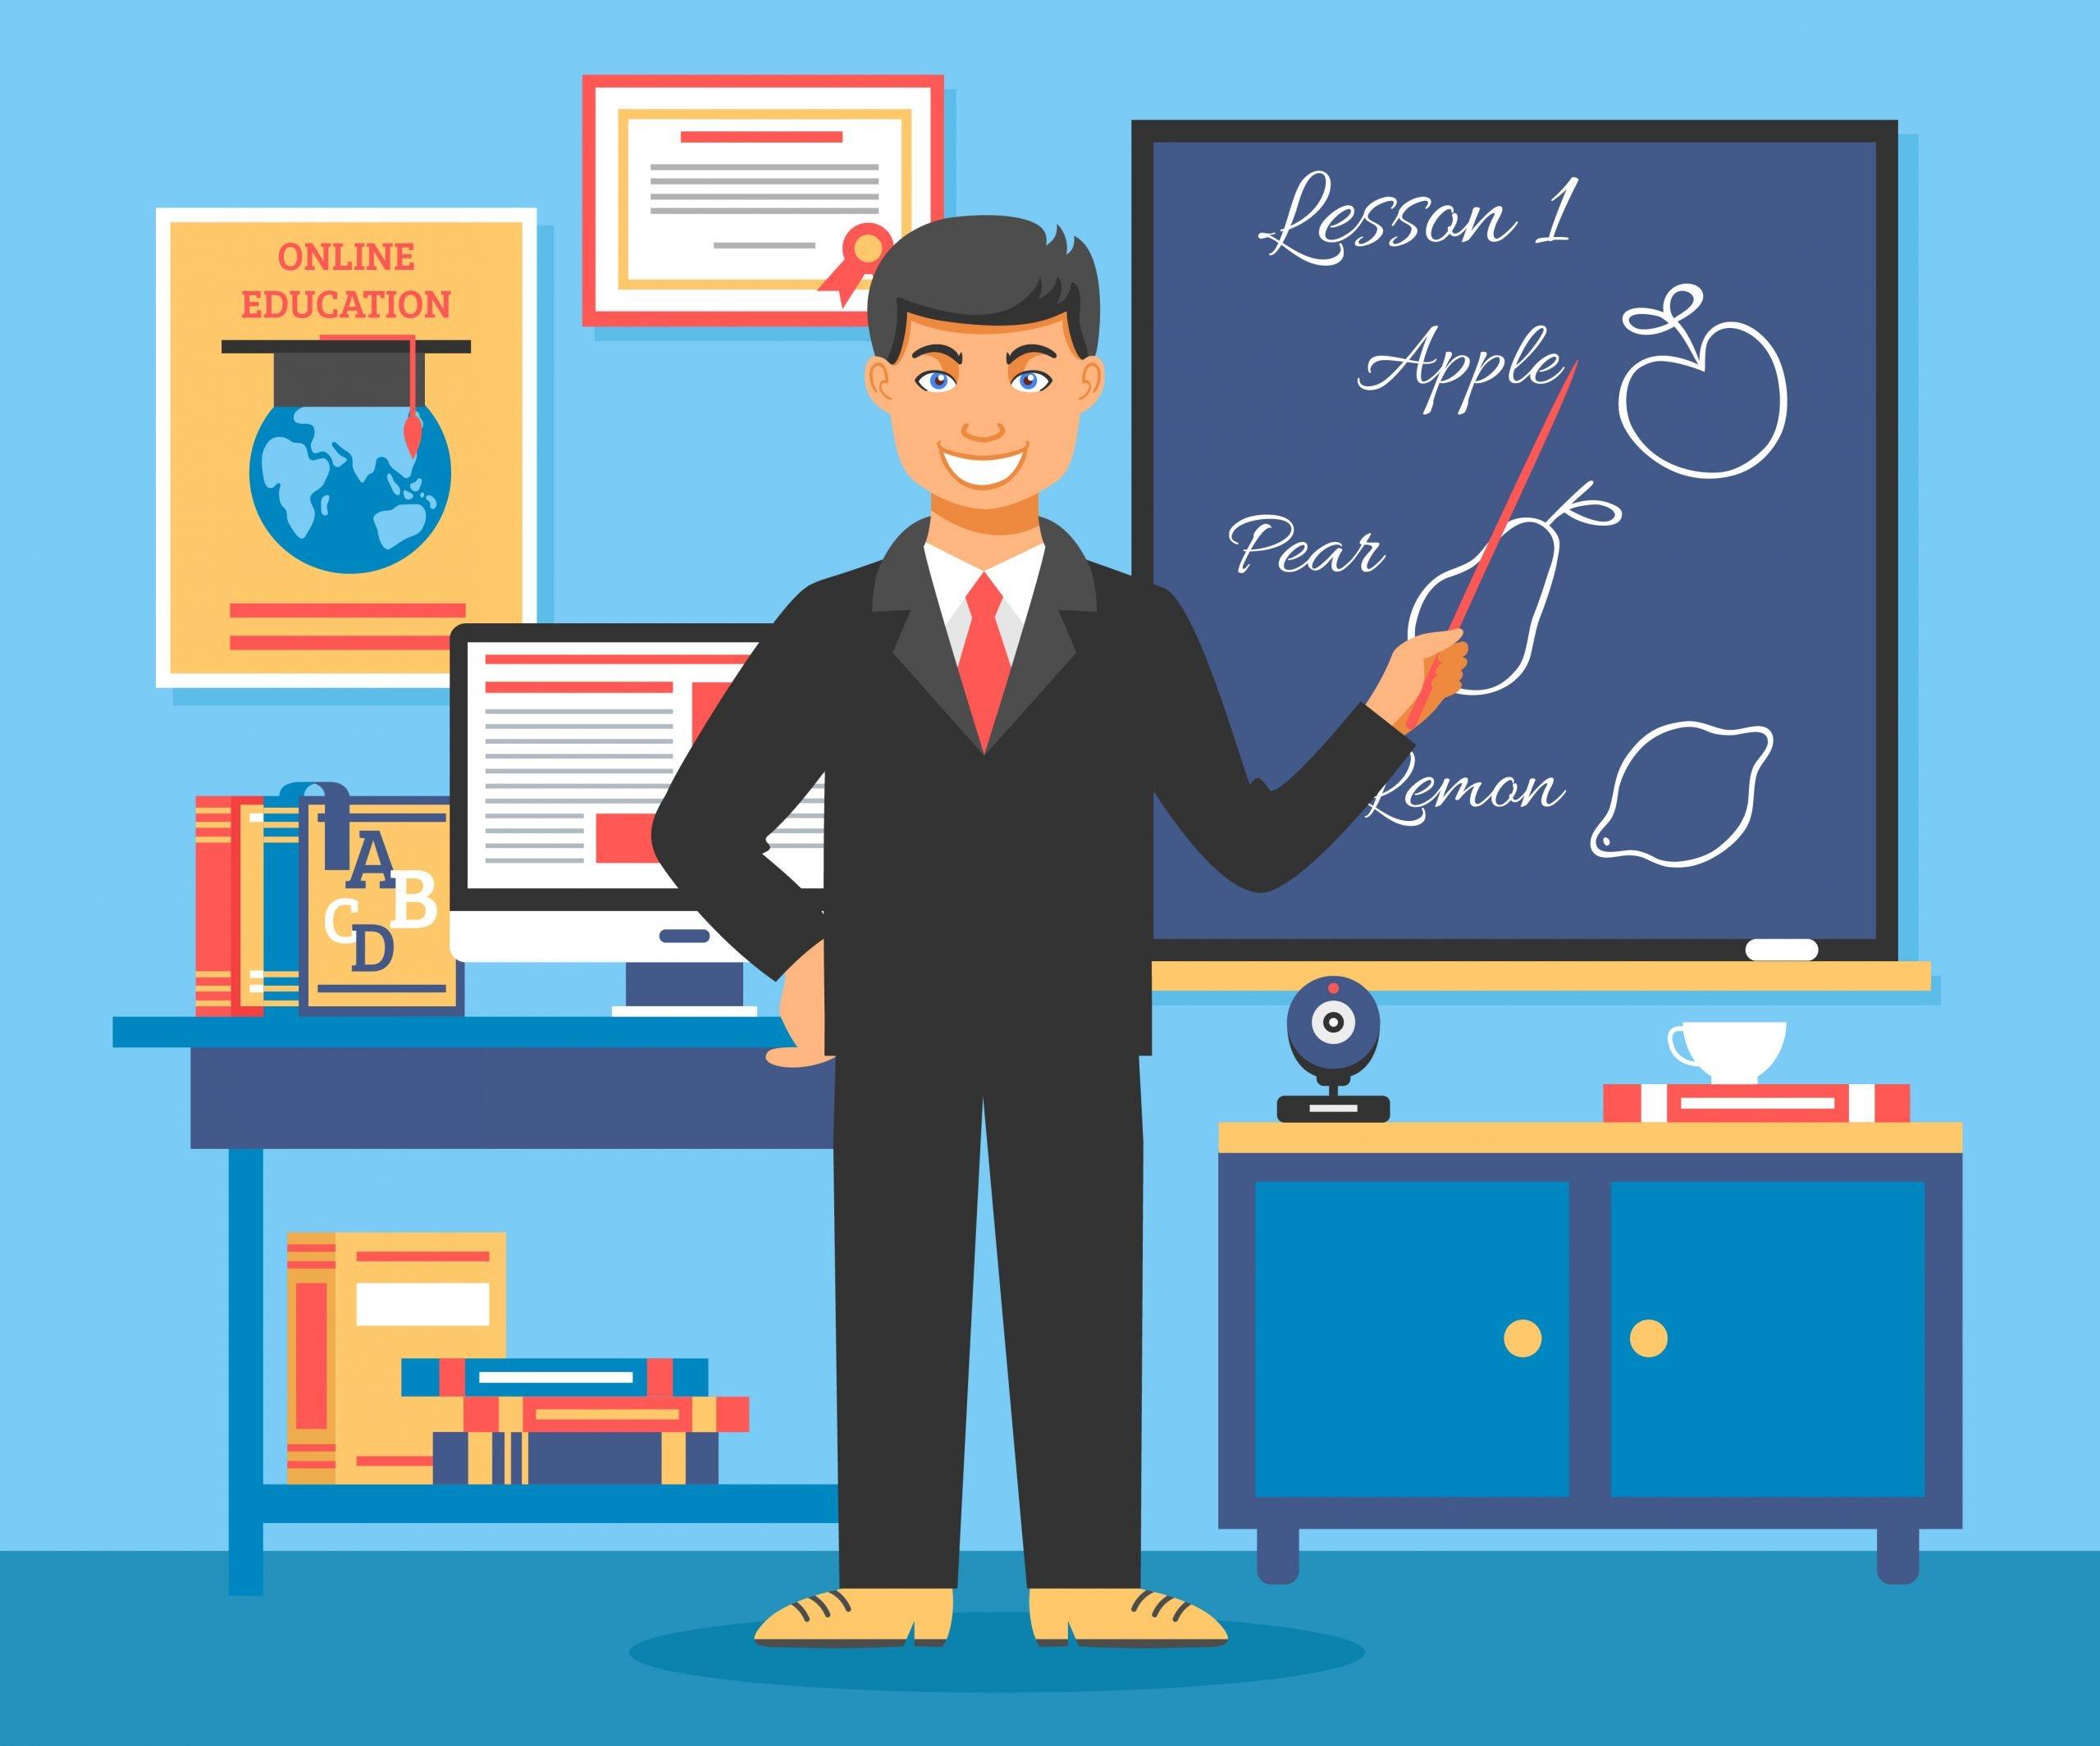 Online Education Training Illustration